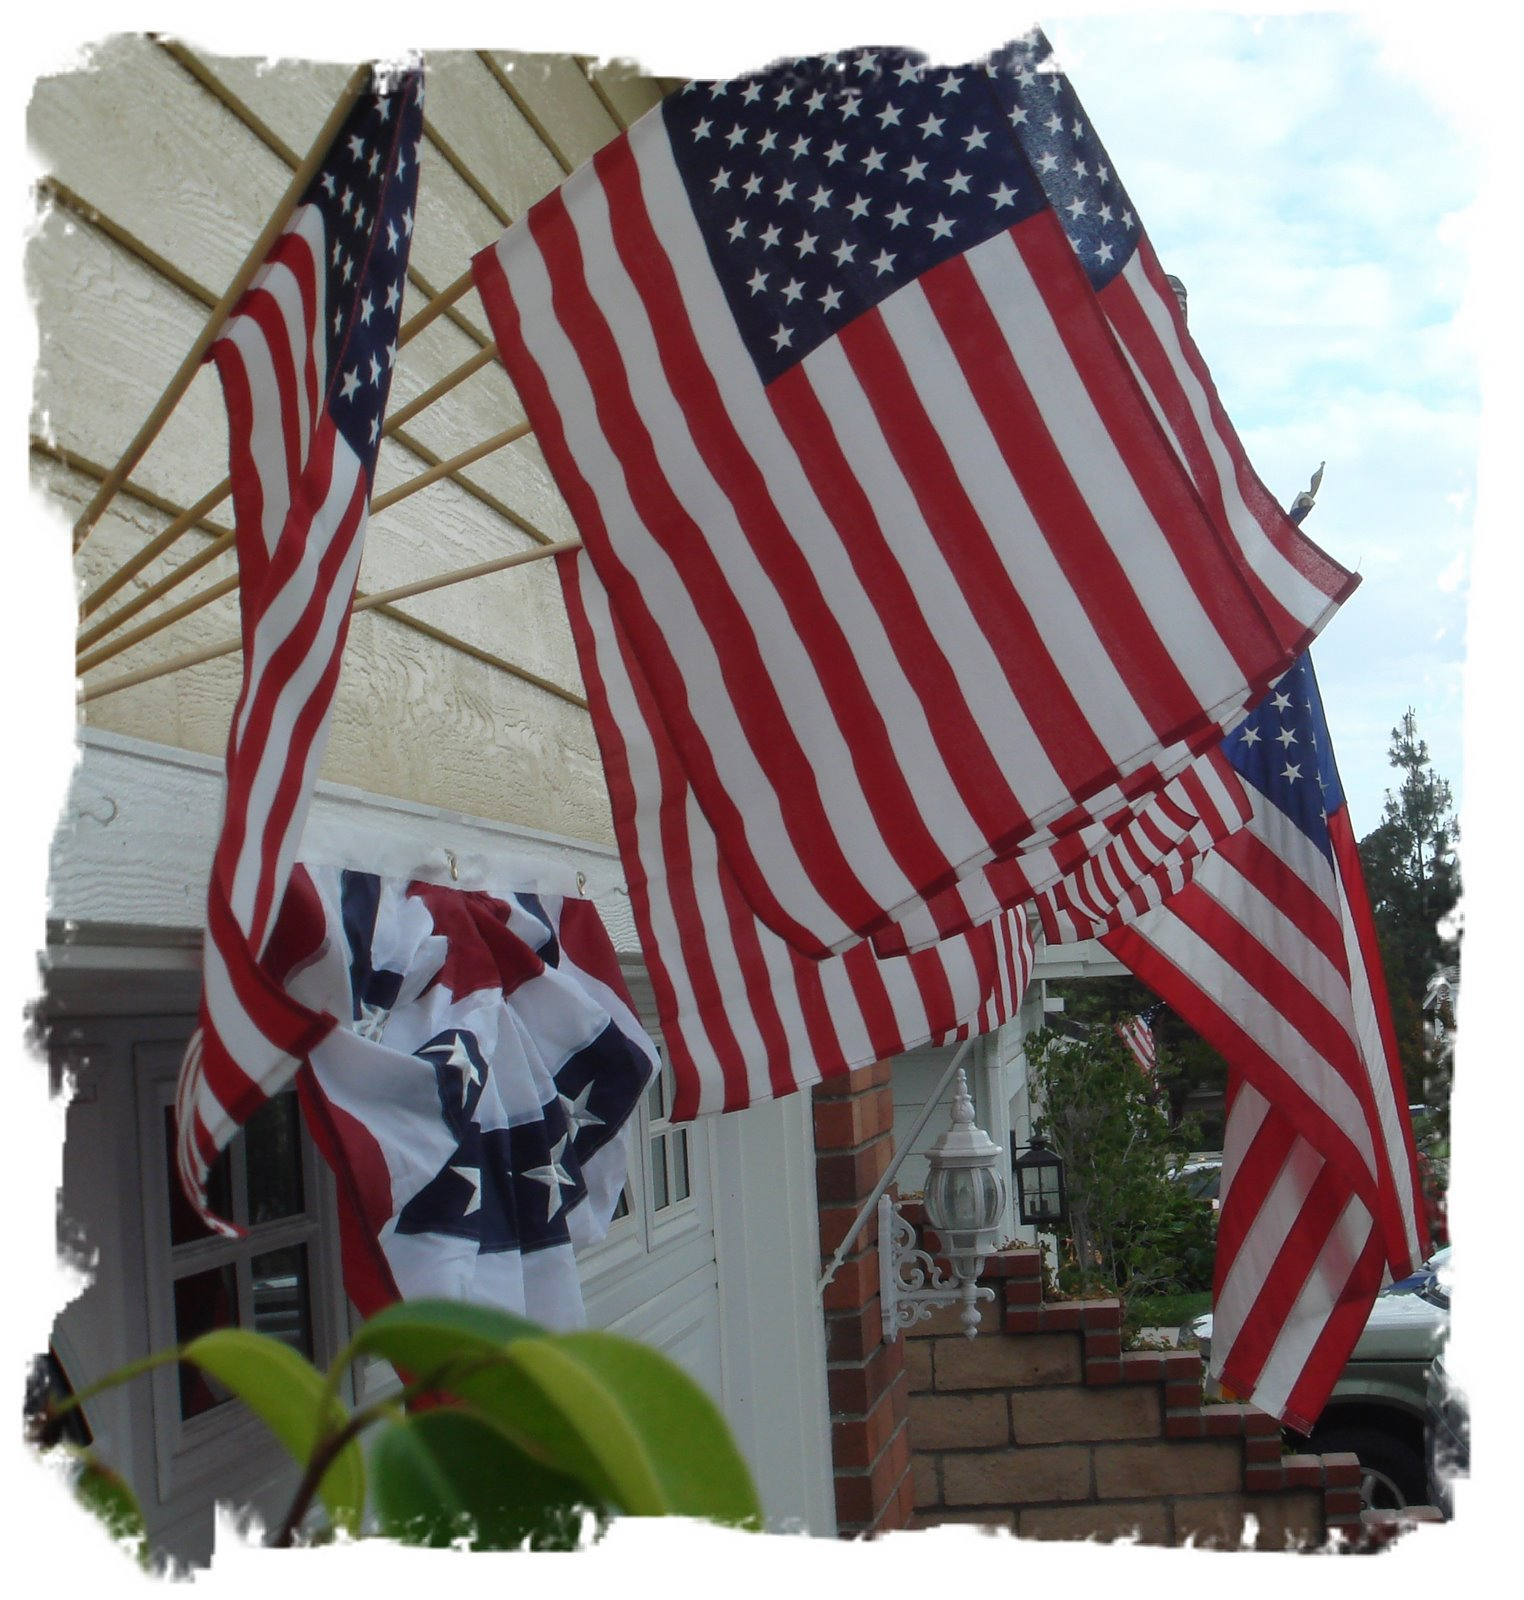 [flags2.jpg]